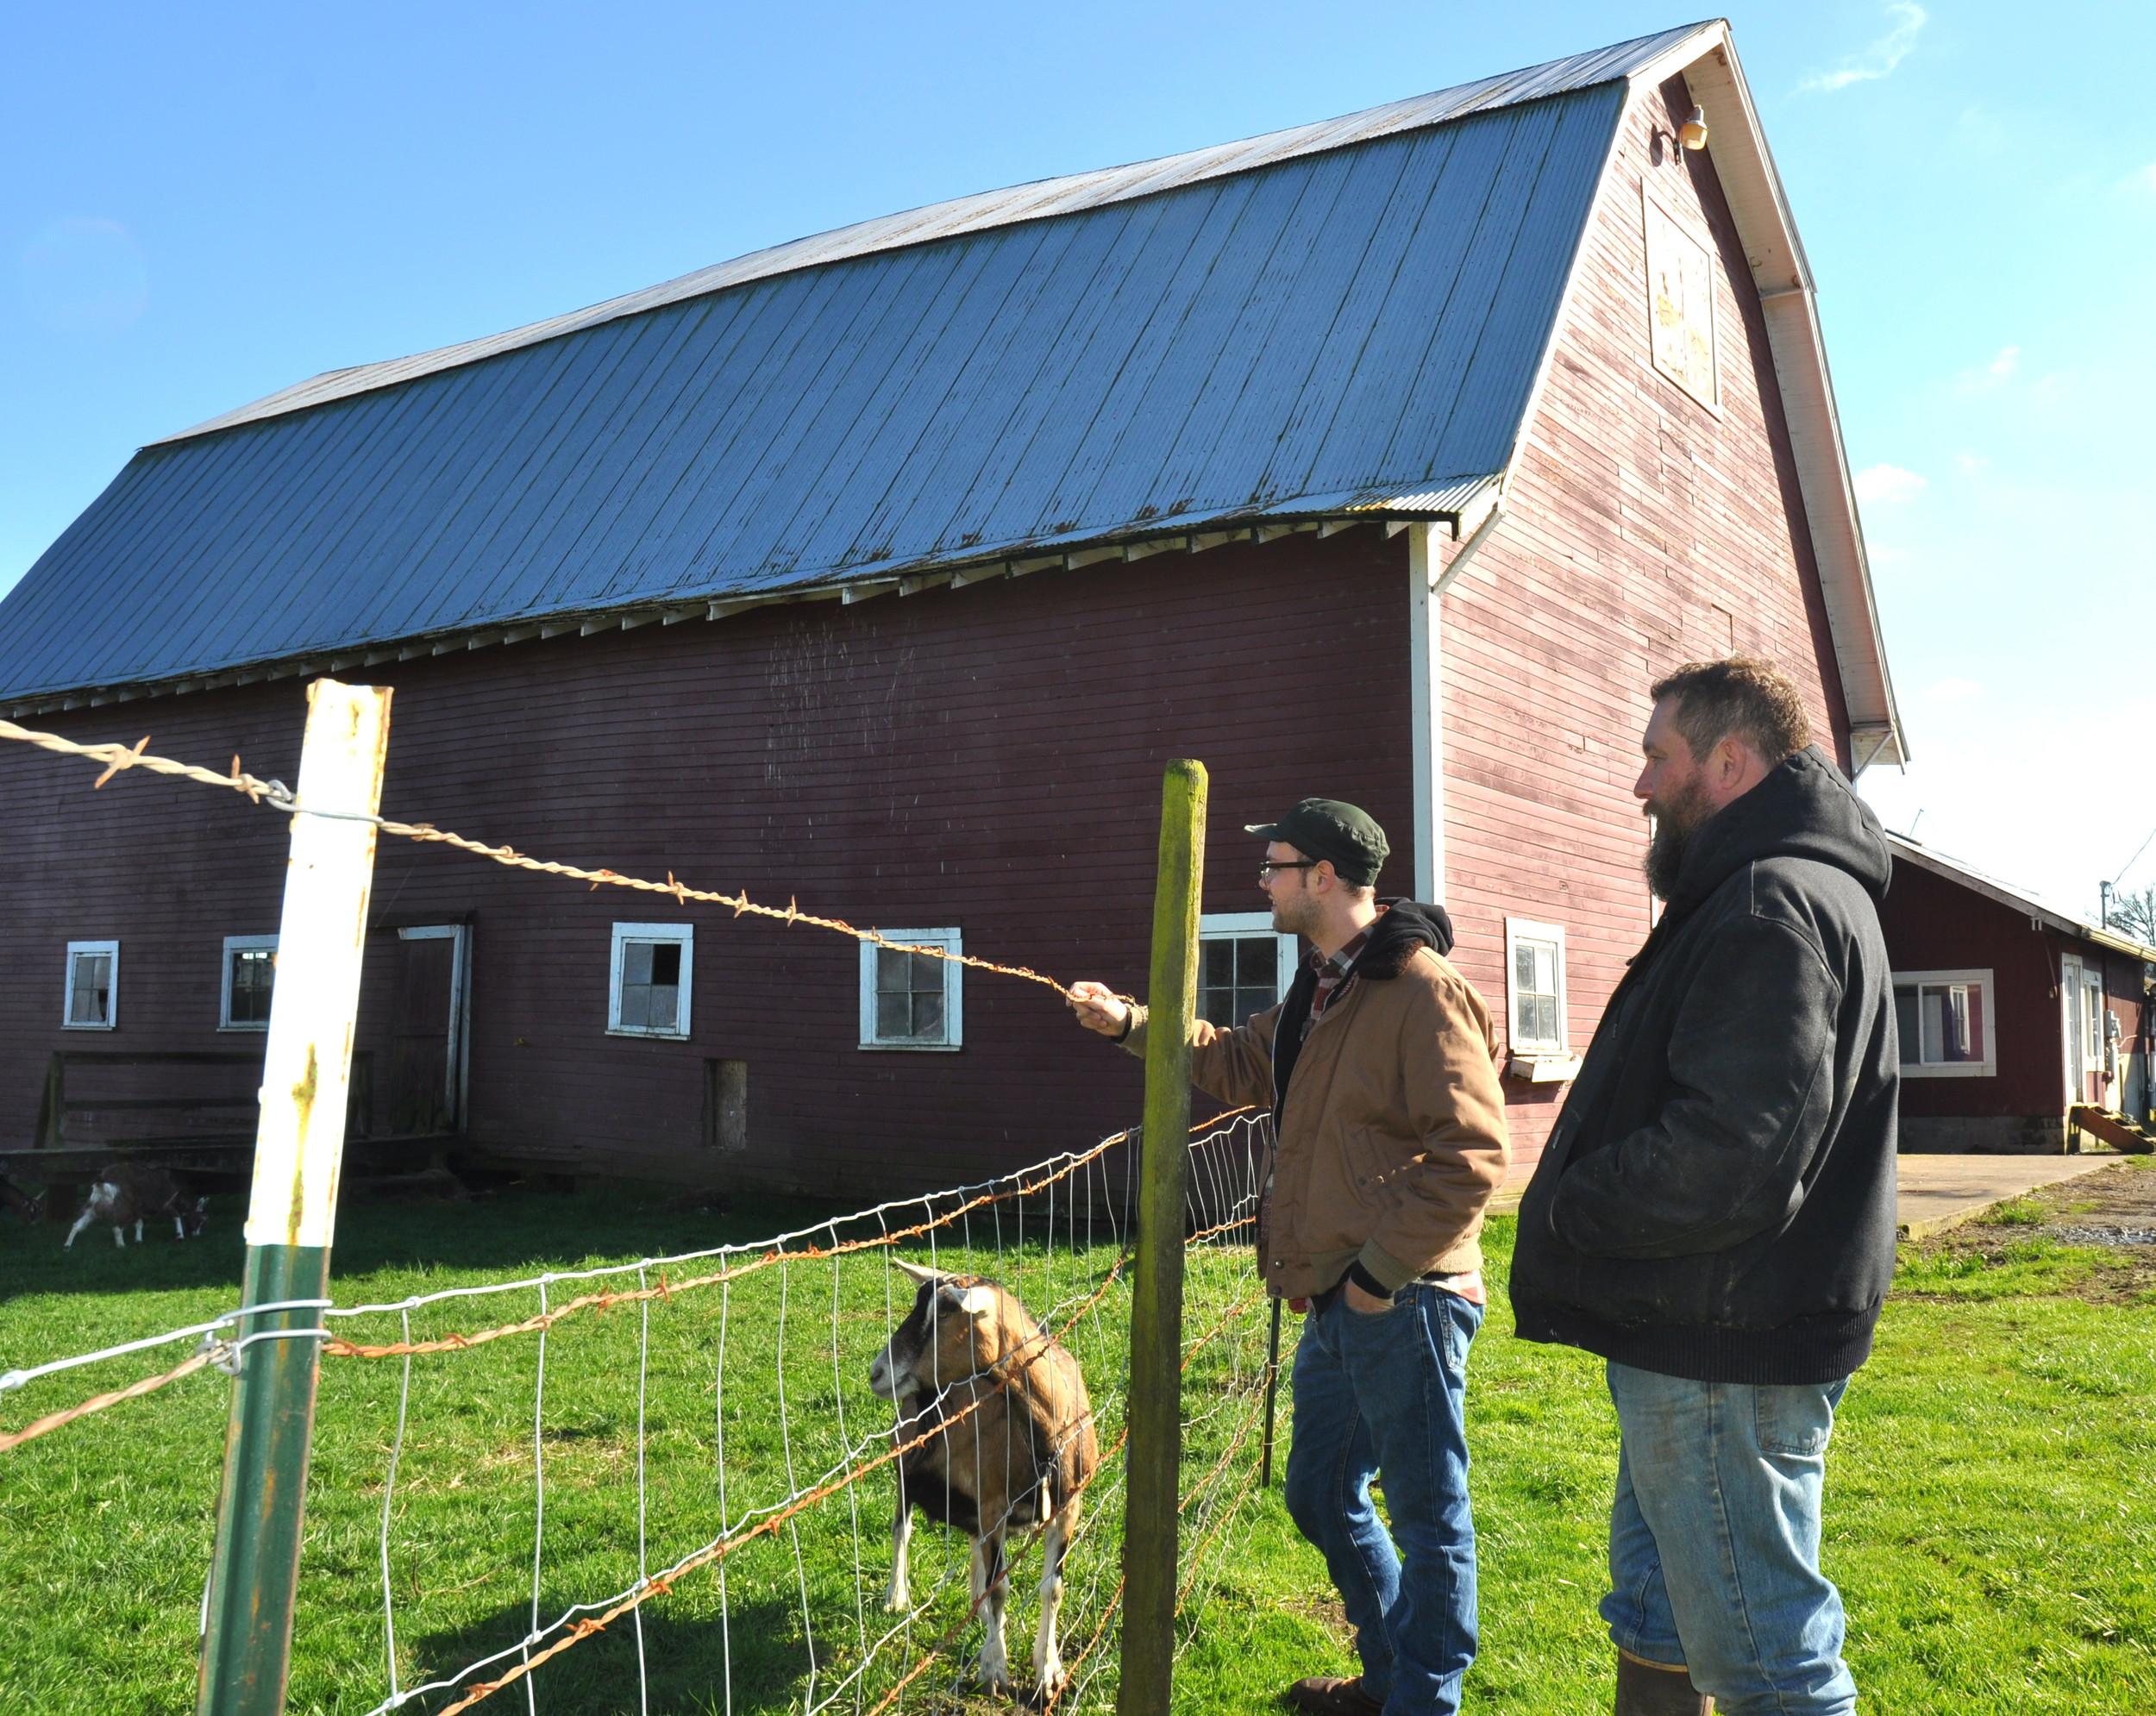 The historic barn at Twin Oaks Creamery in Chehalis. Photo copyright 2013 by Zachary D. Lyons.